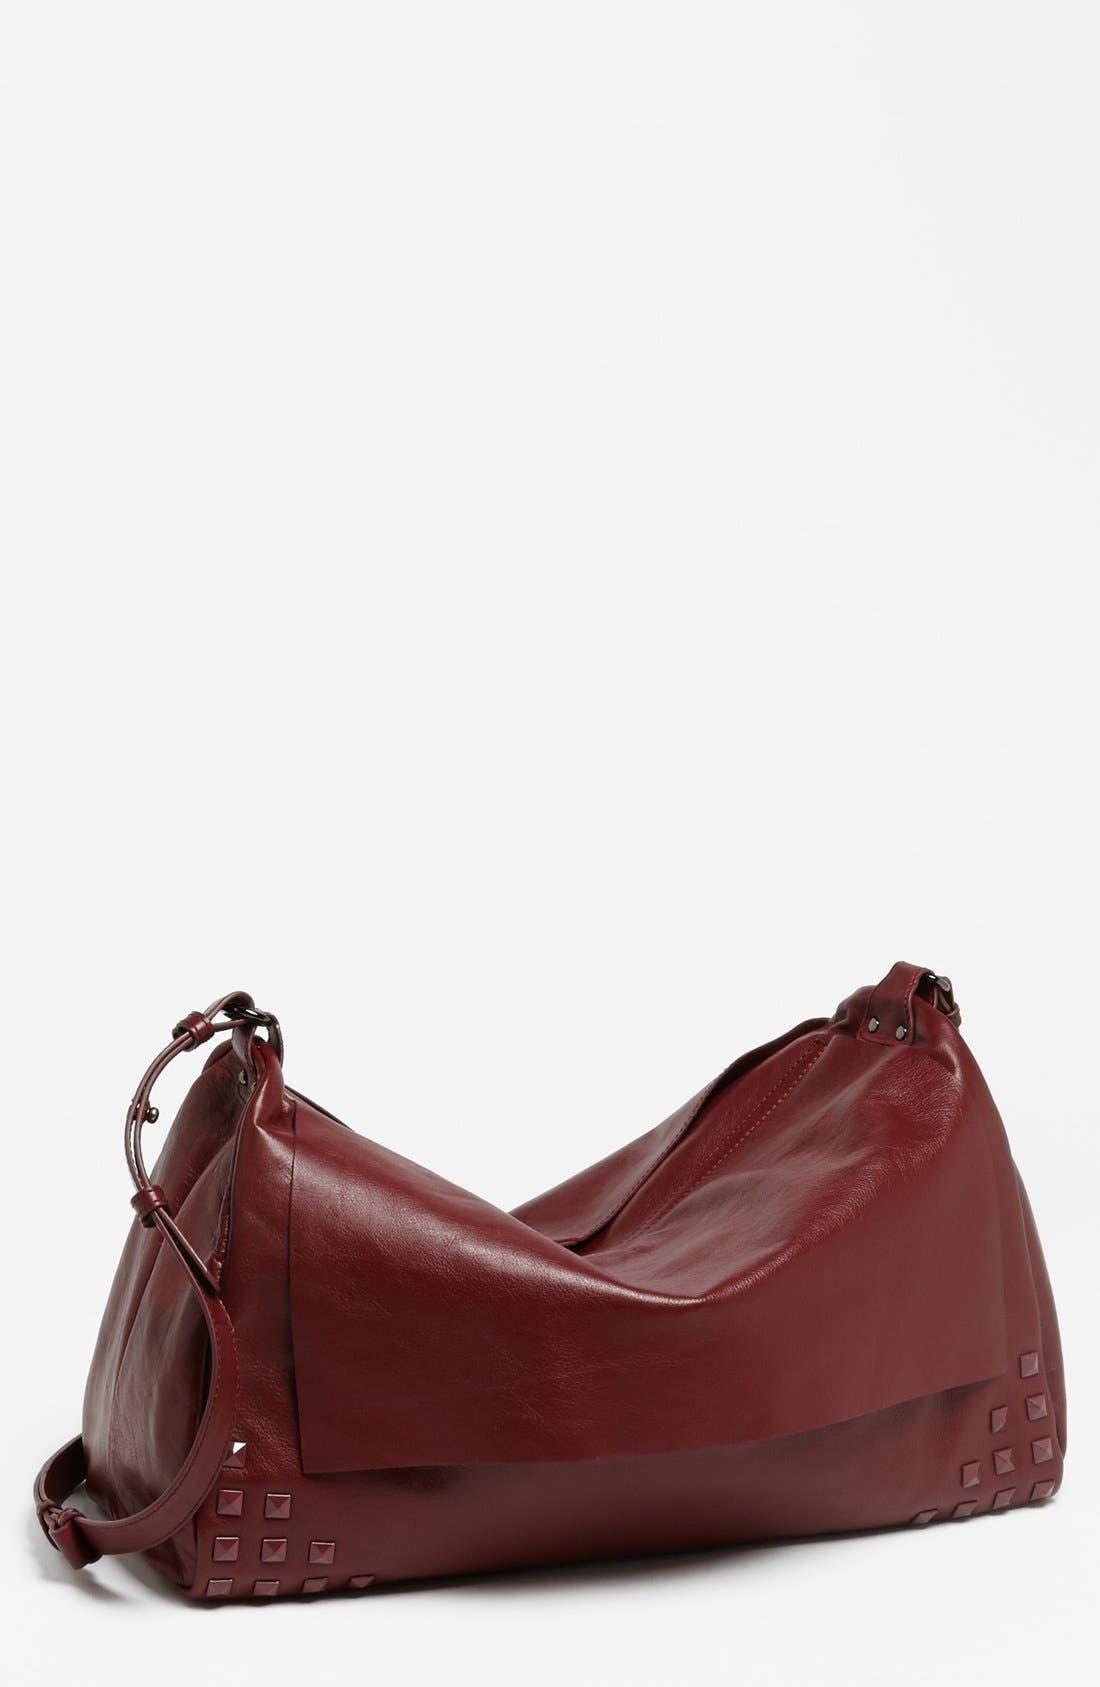 Main Image - Trouvé 'Large' Studded Leather Crossbody Bag